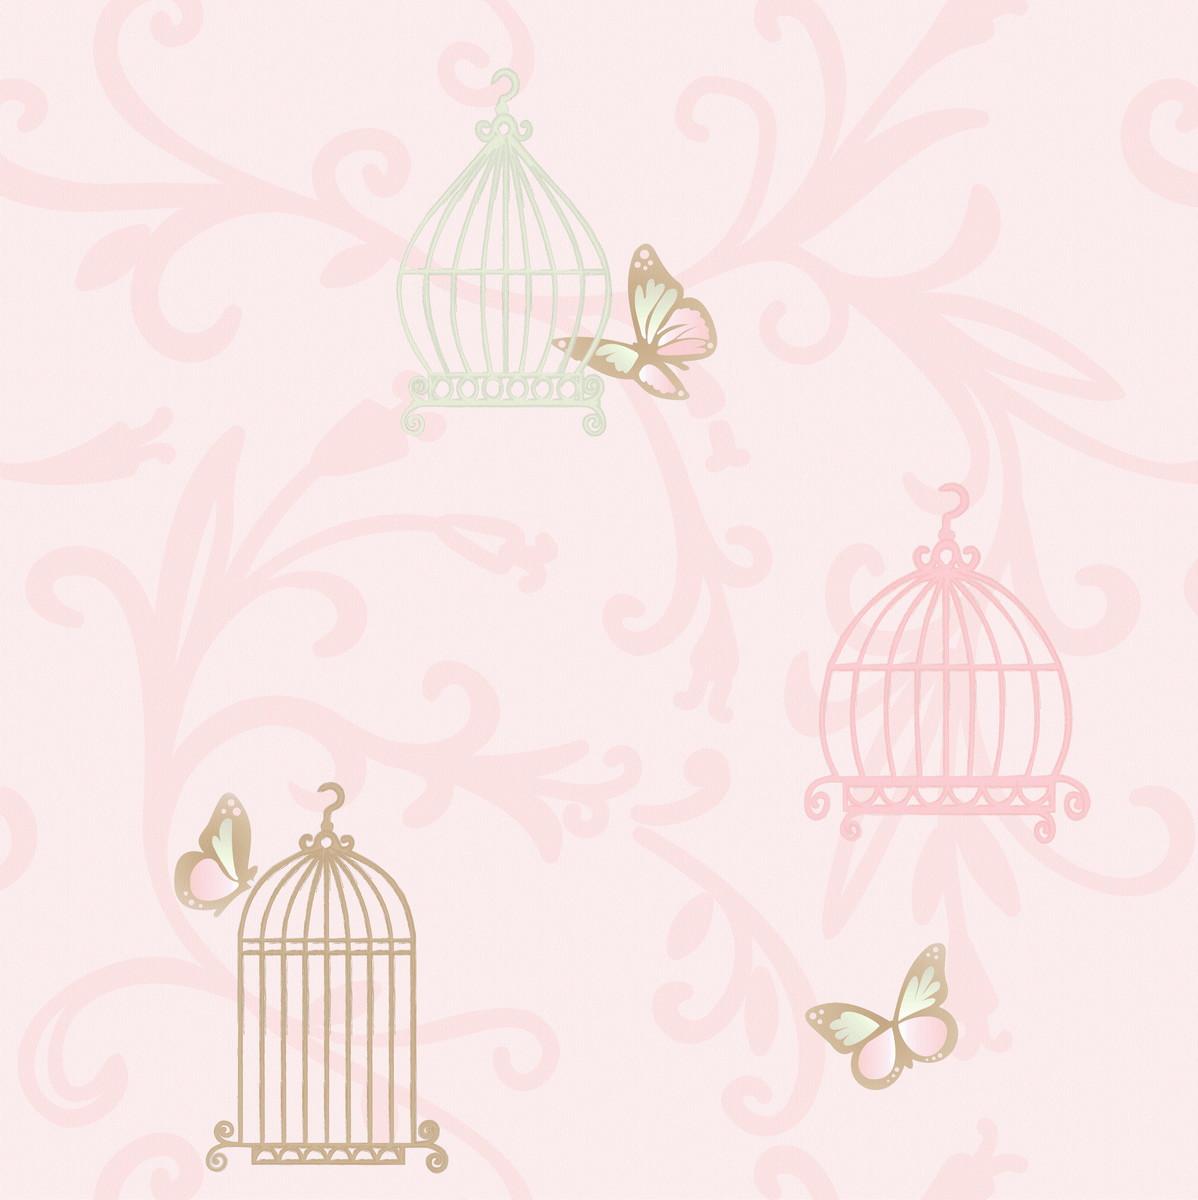 Papel de parede gaiolas rosa 1707 no elo7 wp decor 594e03 - Papel para paredes baratos ...